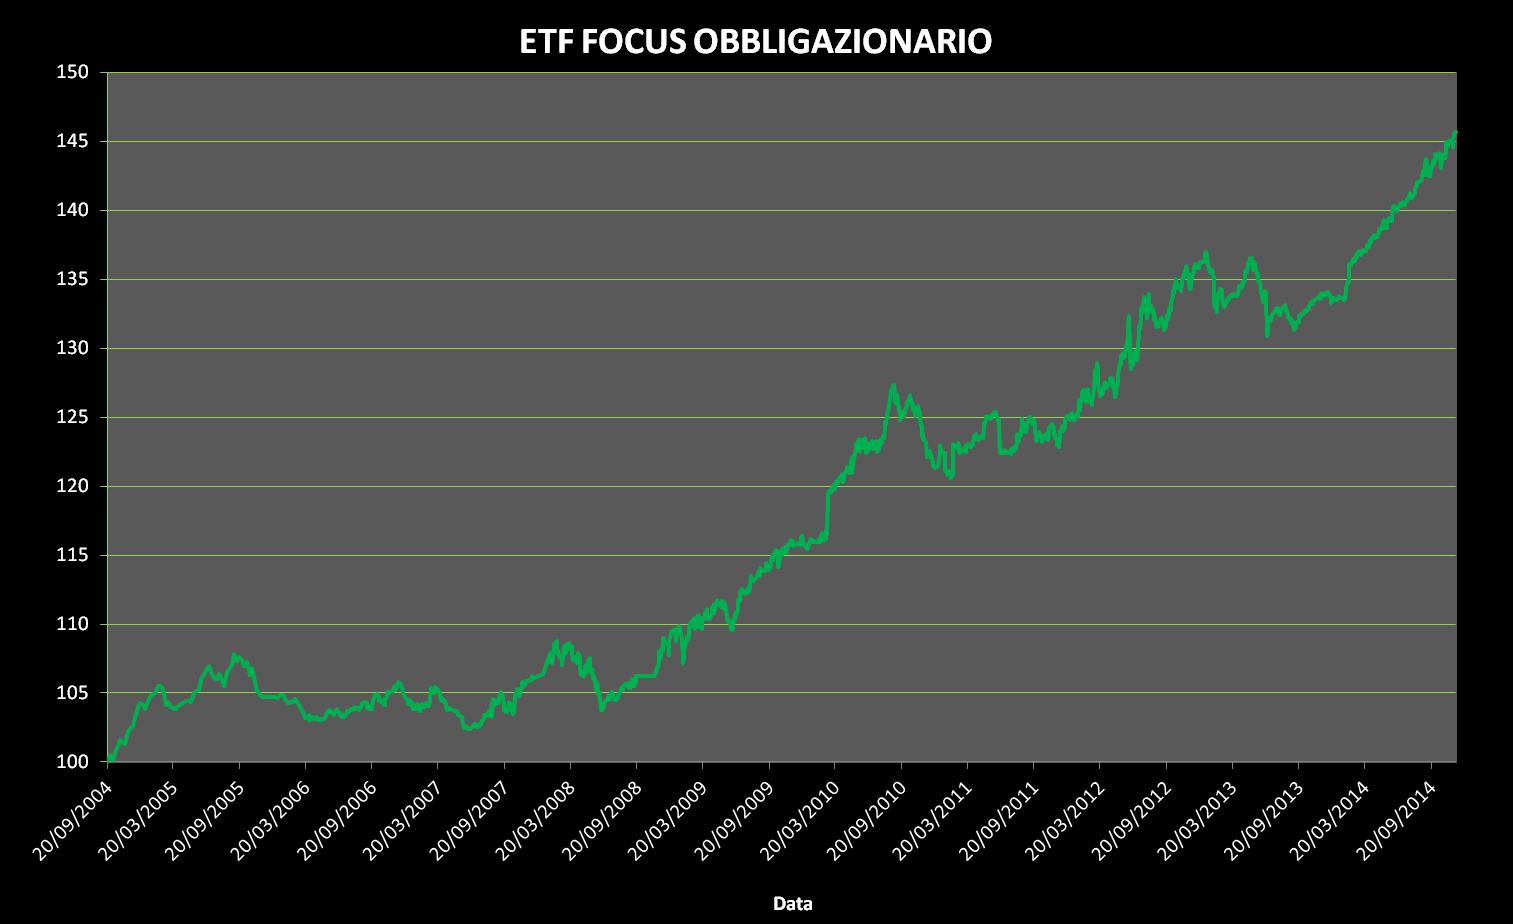 Andamento ETF Focus Obbligazionario